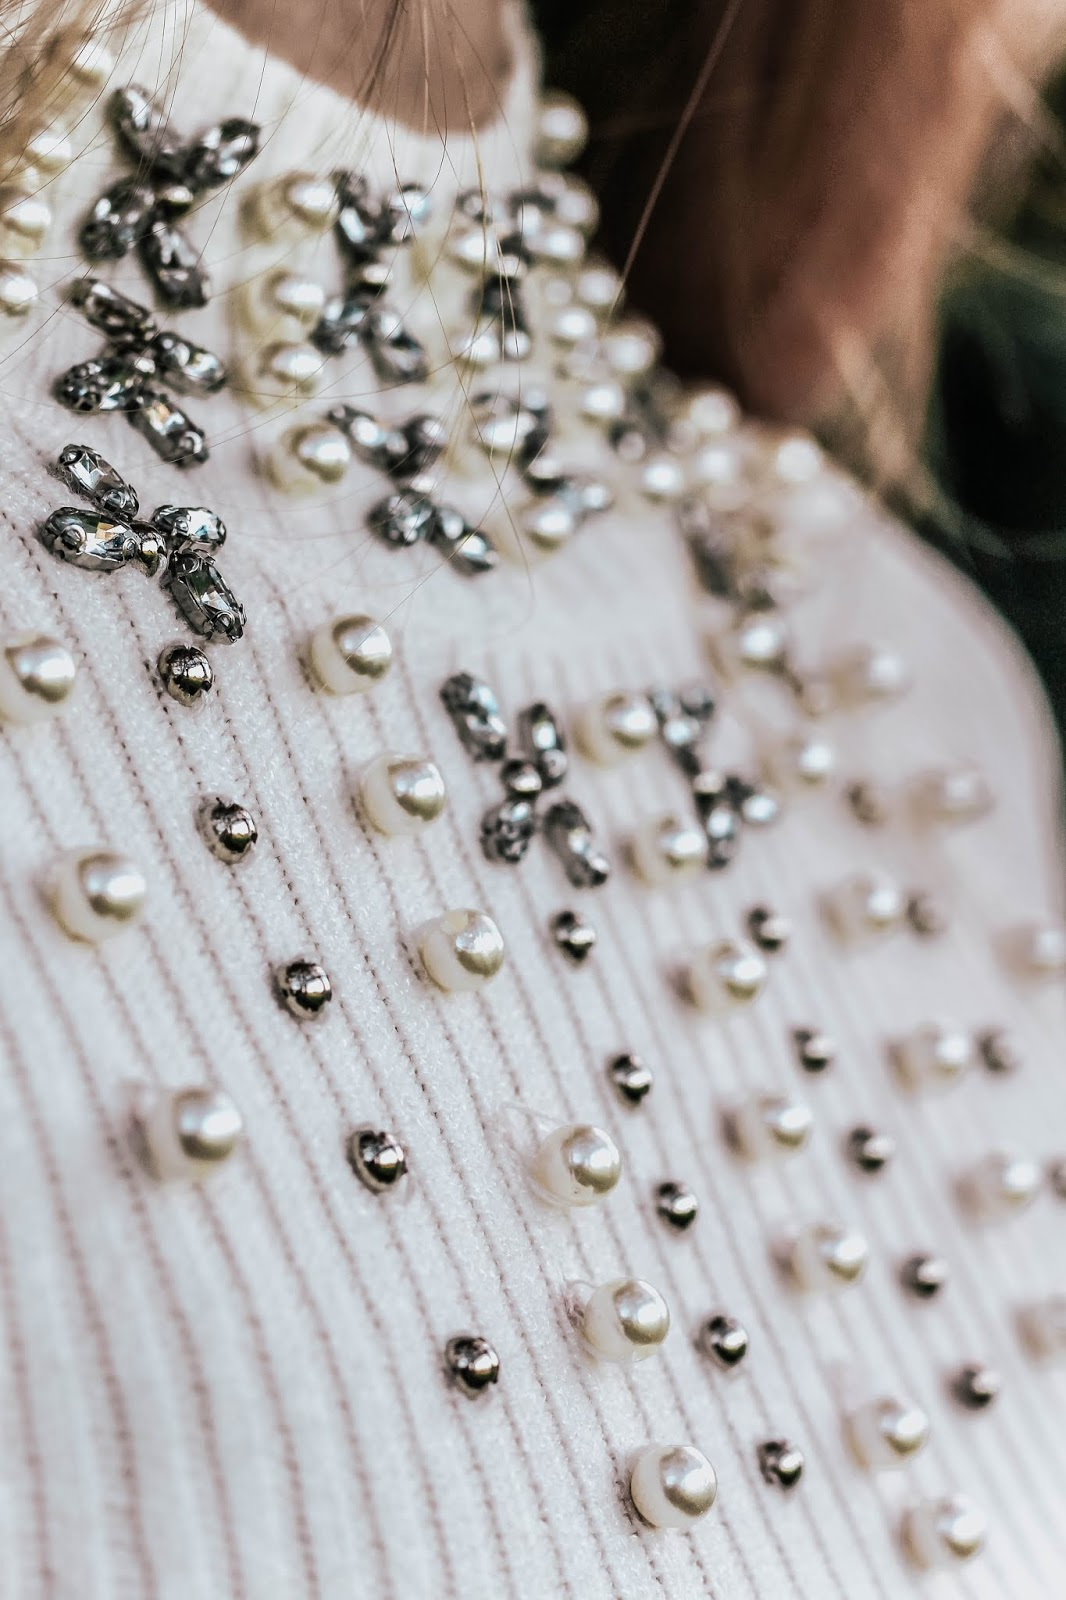 ASOS White Jewel Embellished Long Sleeve Jumper